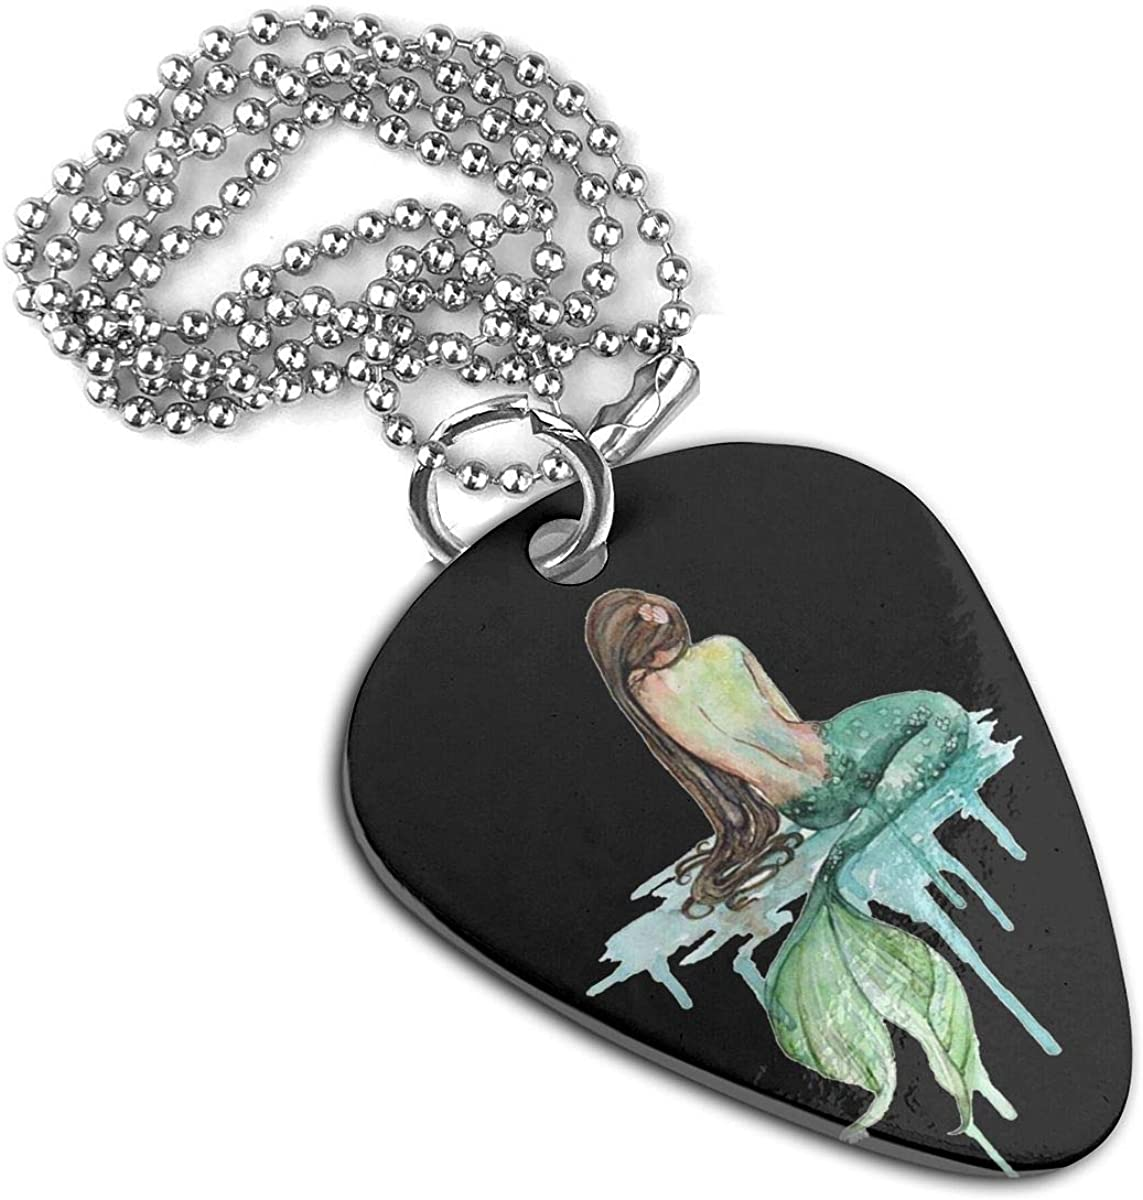 Mermaid Guitar Pick Necklace Pendant Pet Card Keychain